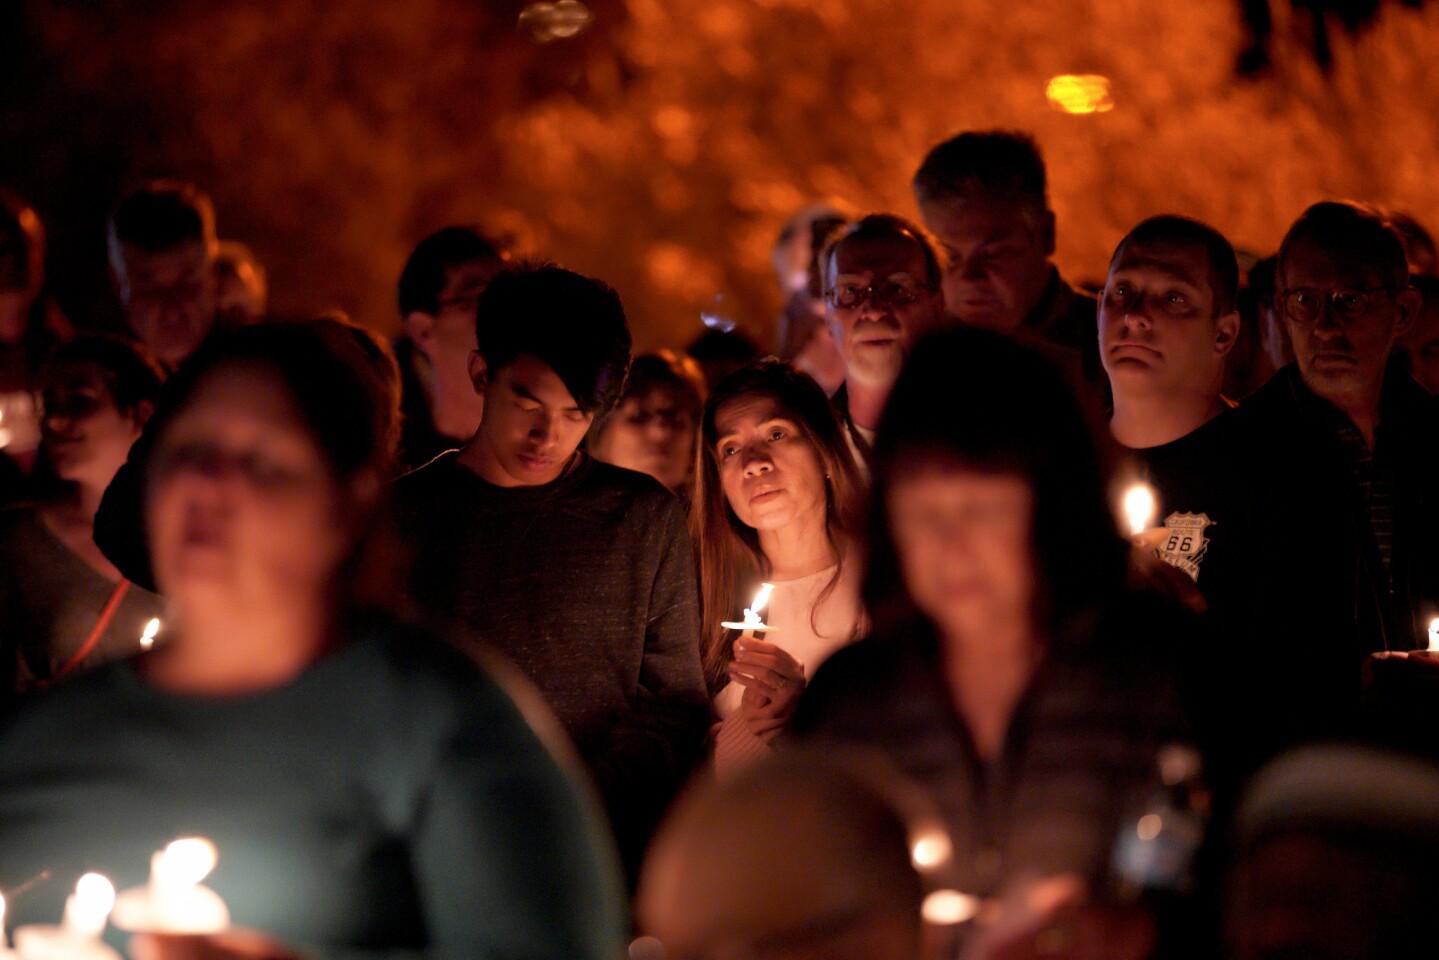 Candlelight vigil at Temple Adat Shalom